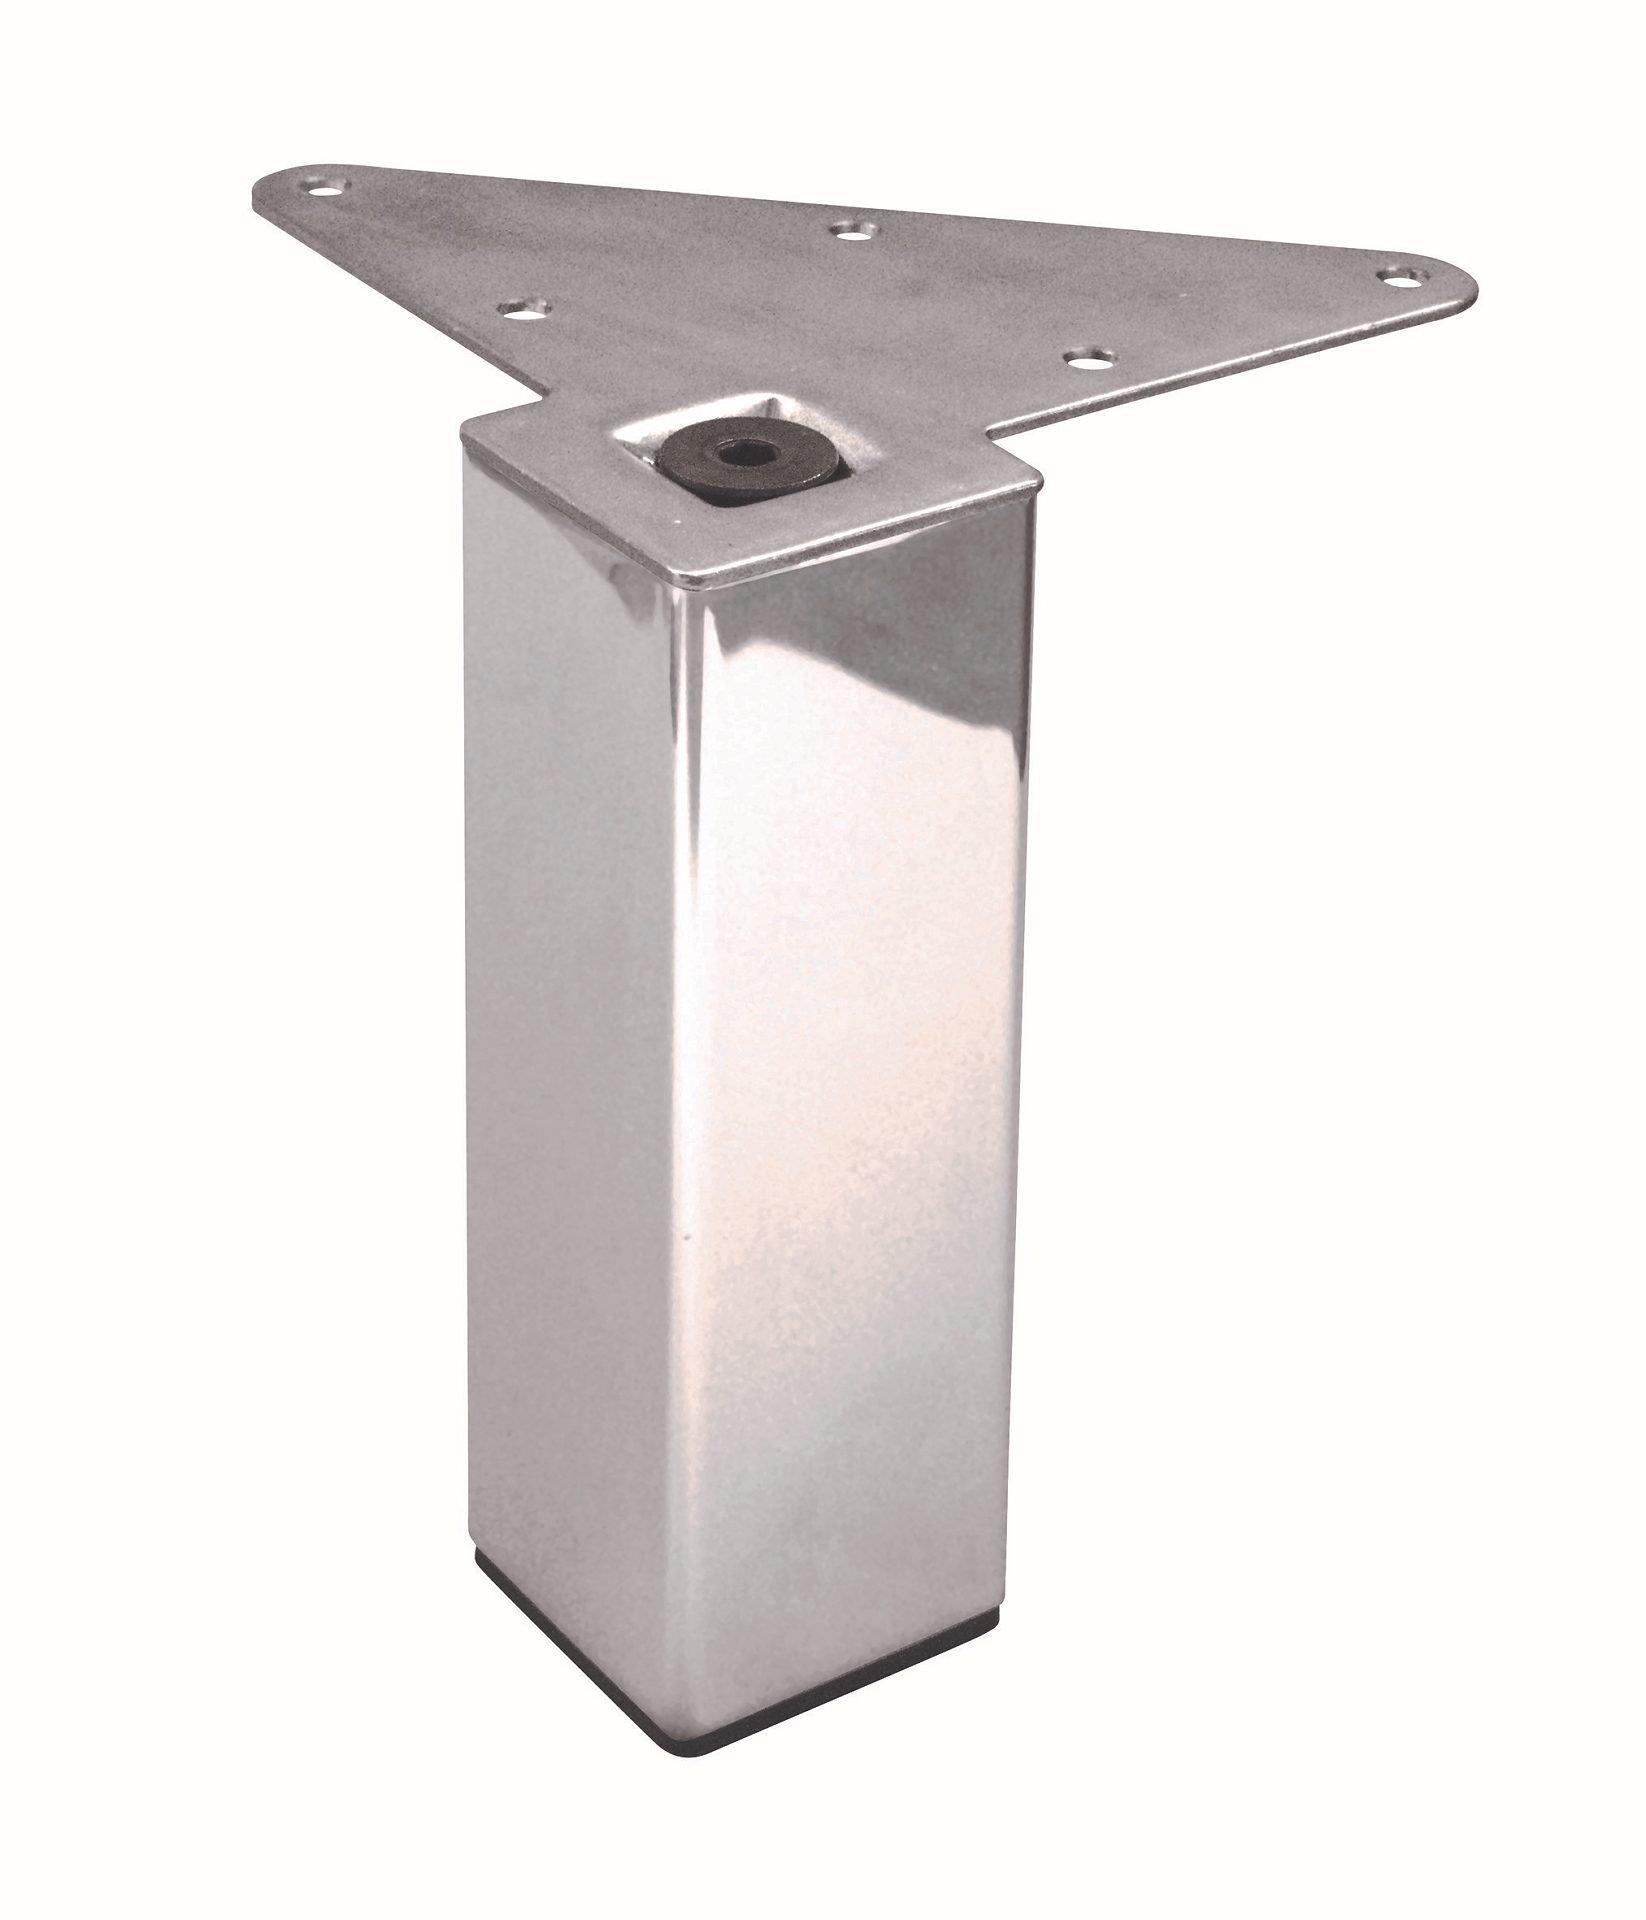 Richelieu Hardware - 555150170 - Box of 4 - Adjustable Furniture Leg - 555 - 22 mm (3/4 Inch) adjustment - Stainless Steel  Finish